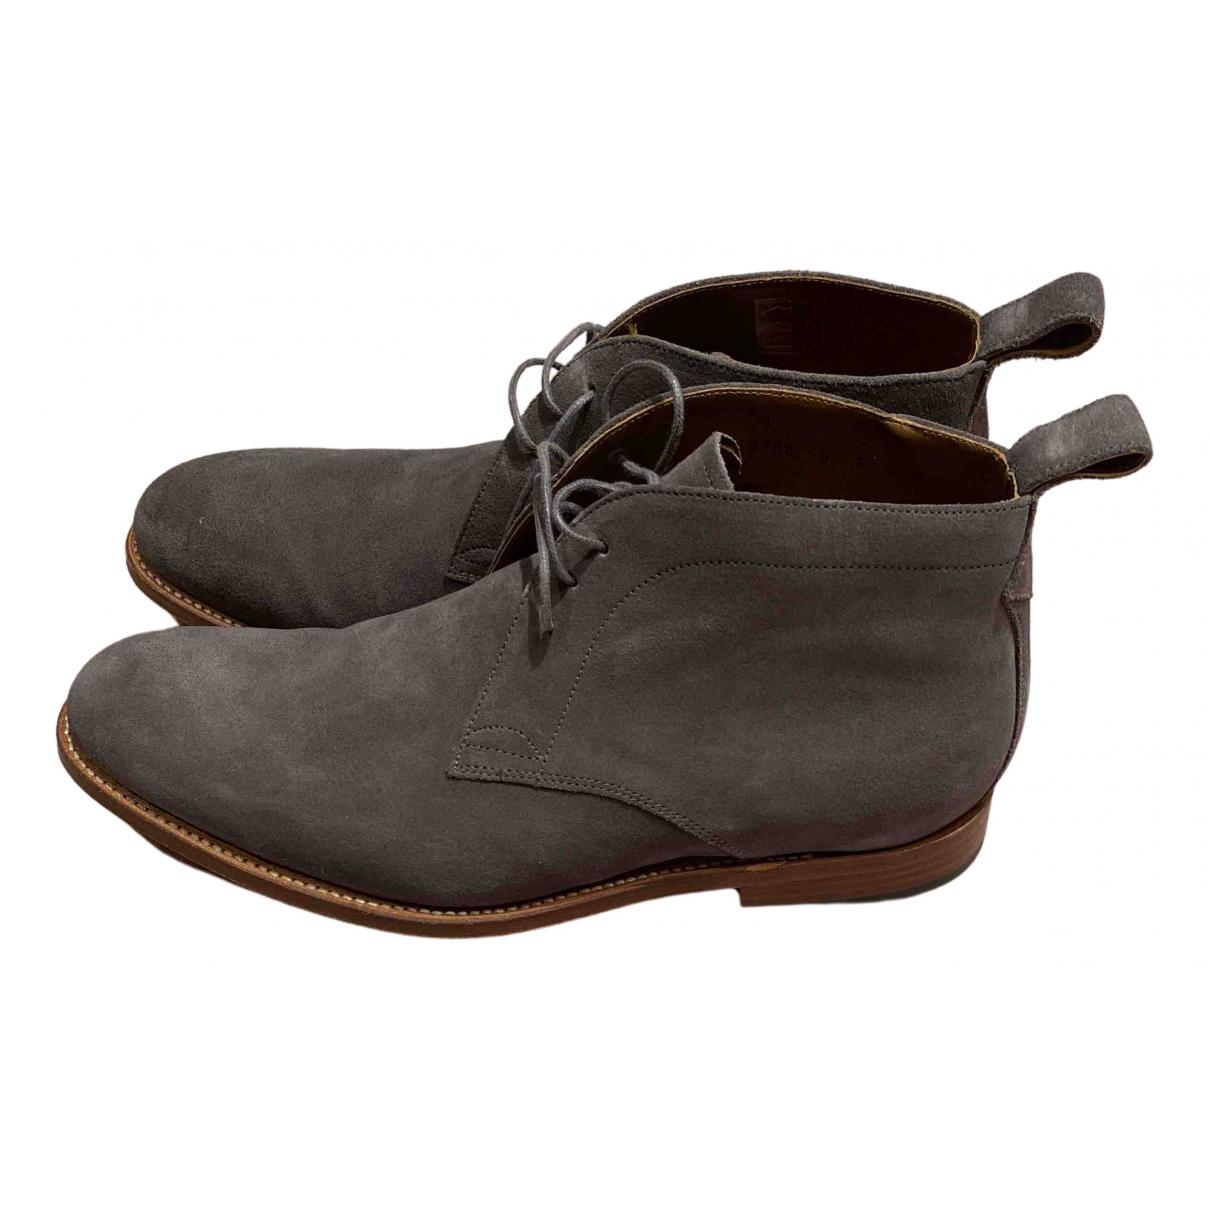 Grenson \N Stiefel in  Grau Veloursleder